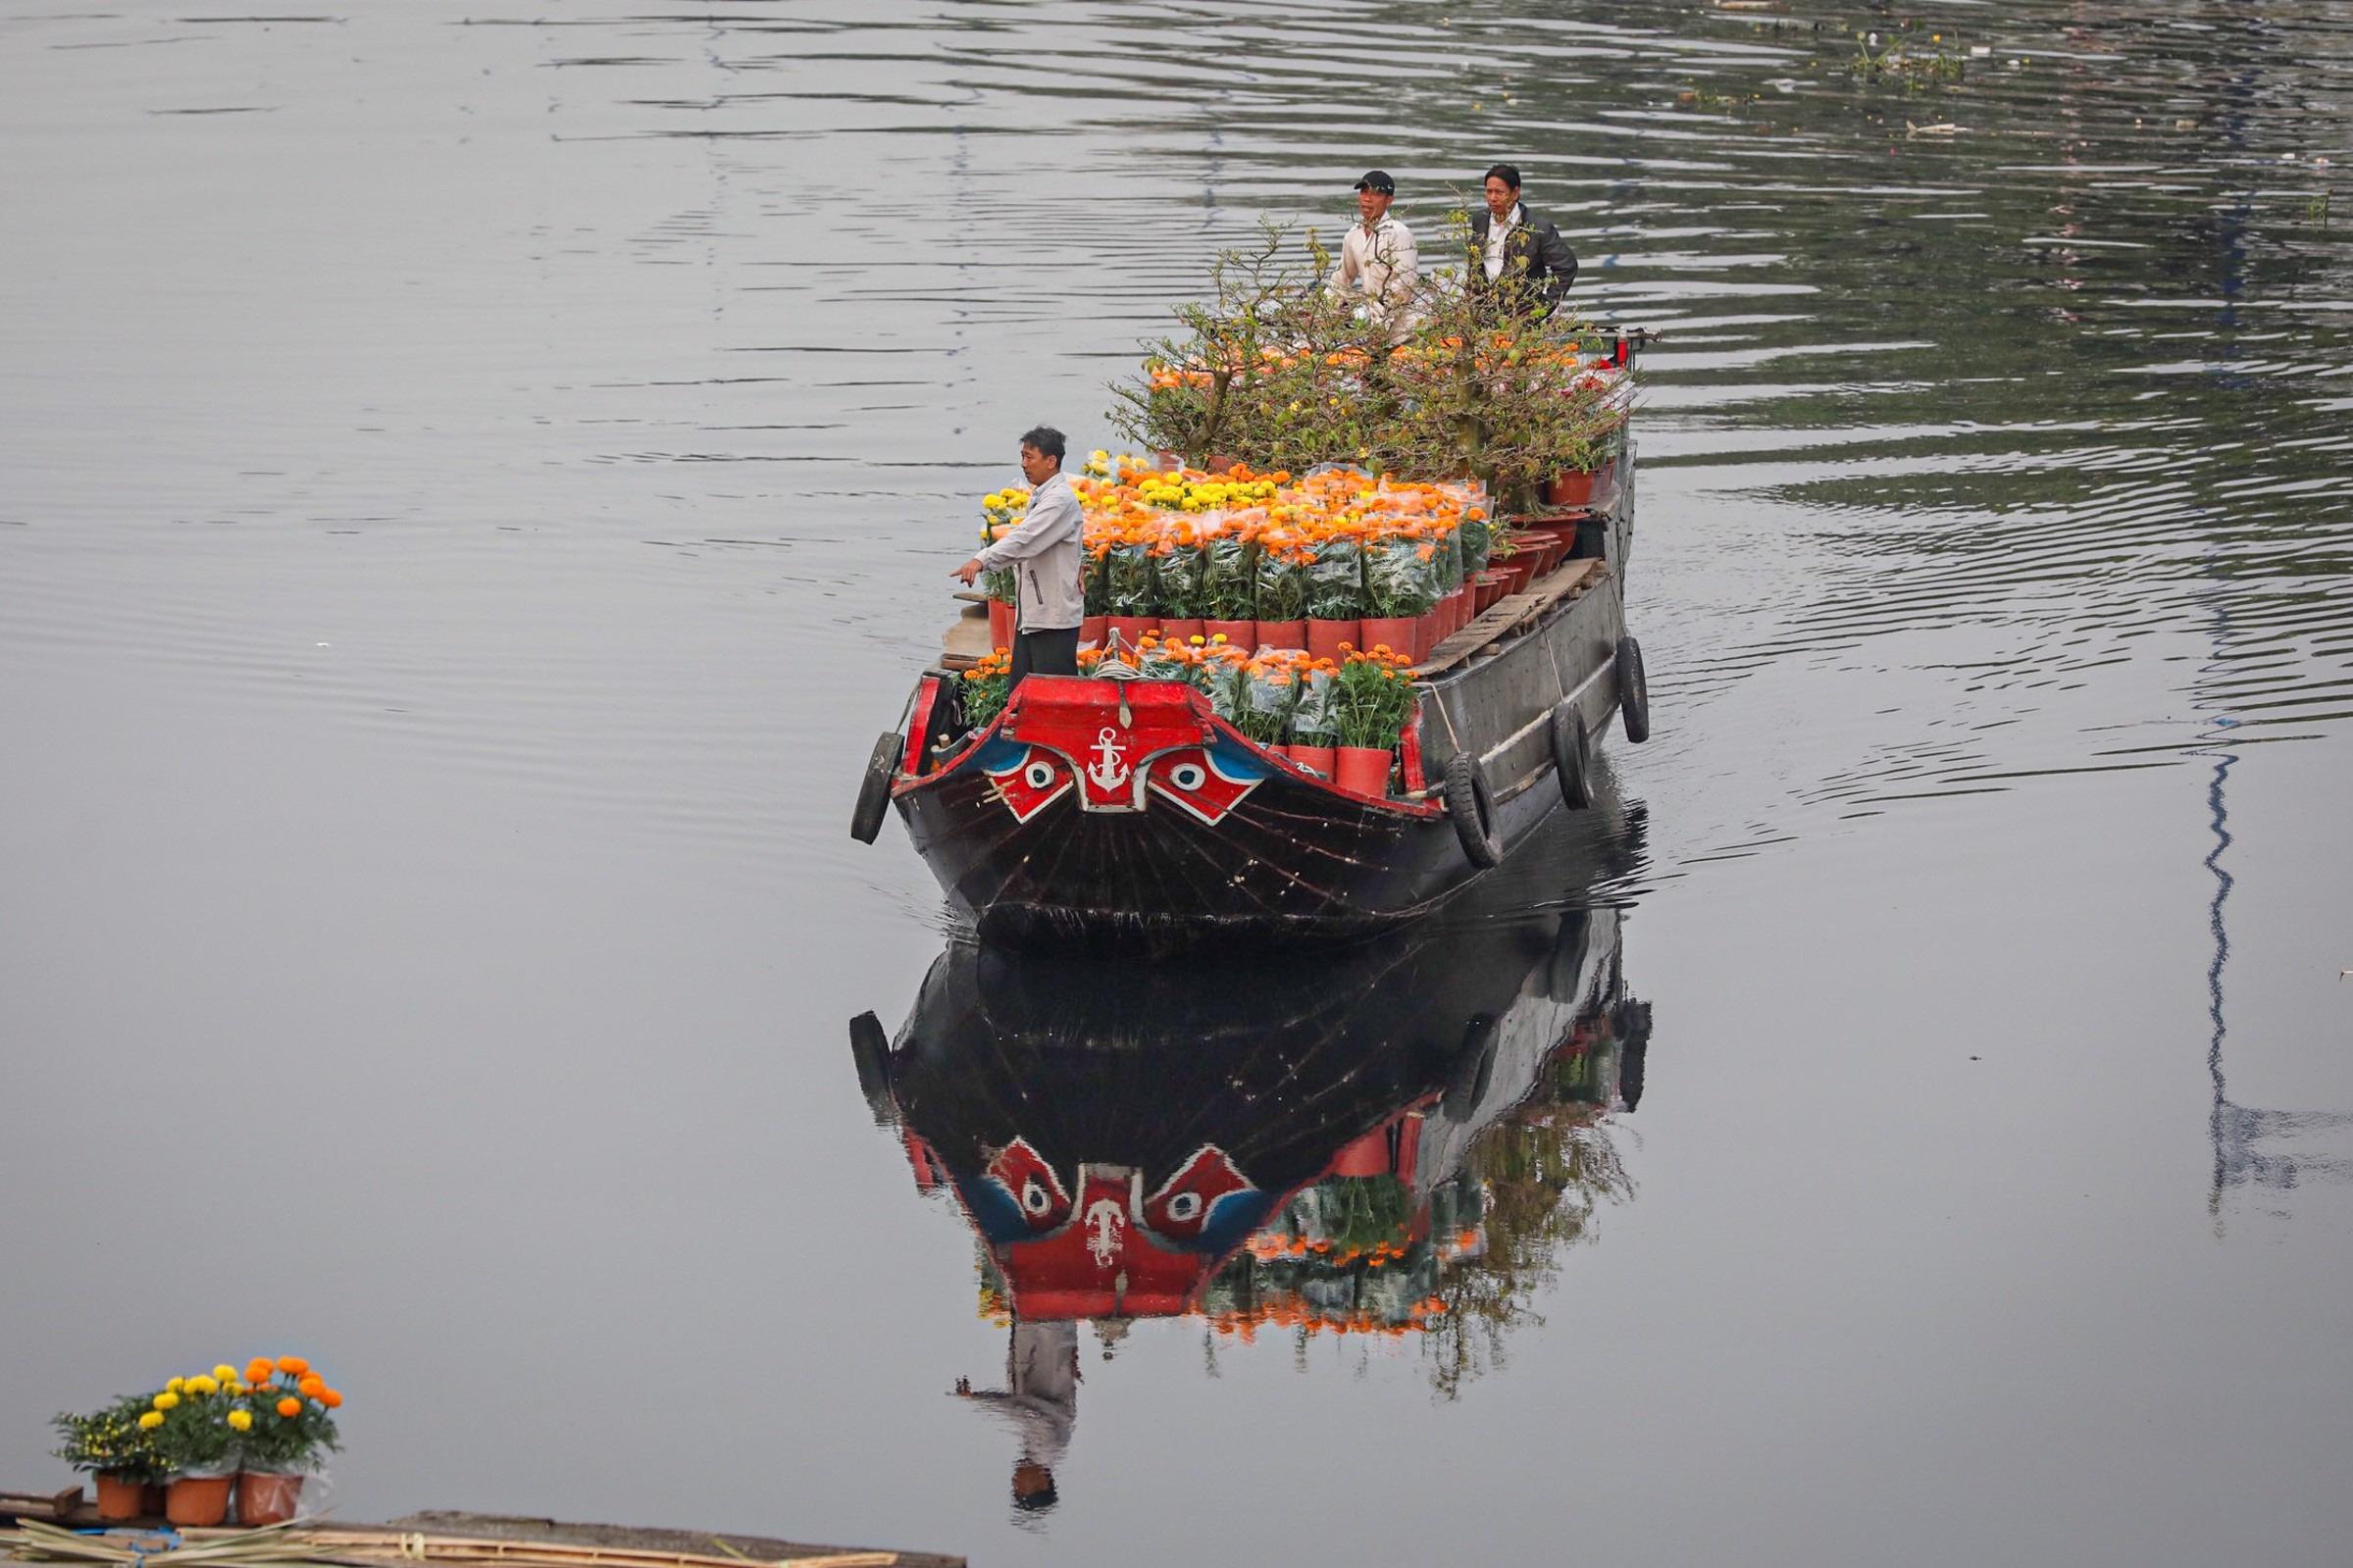 Saigon's floating flower market blooms for Tet alone